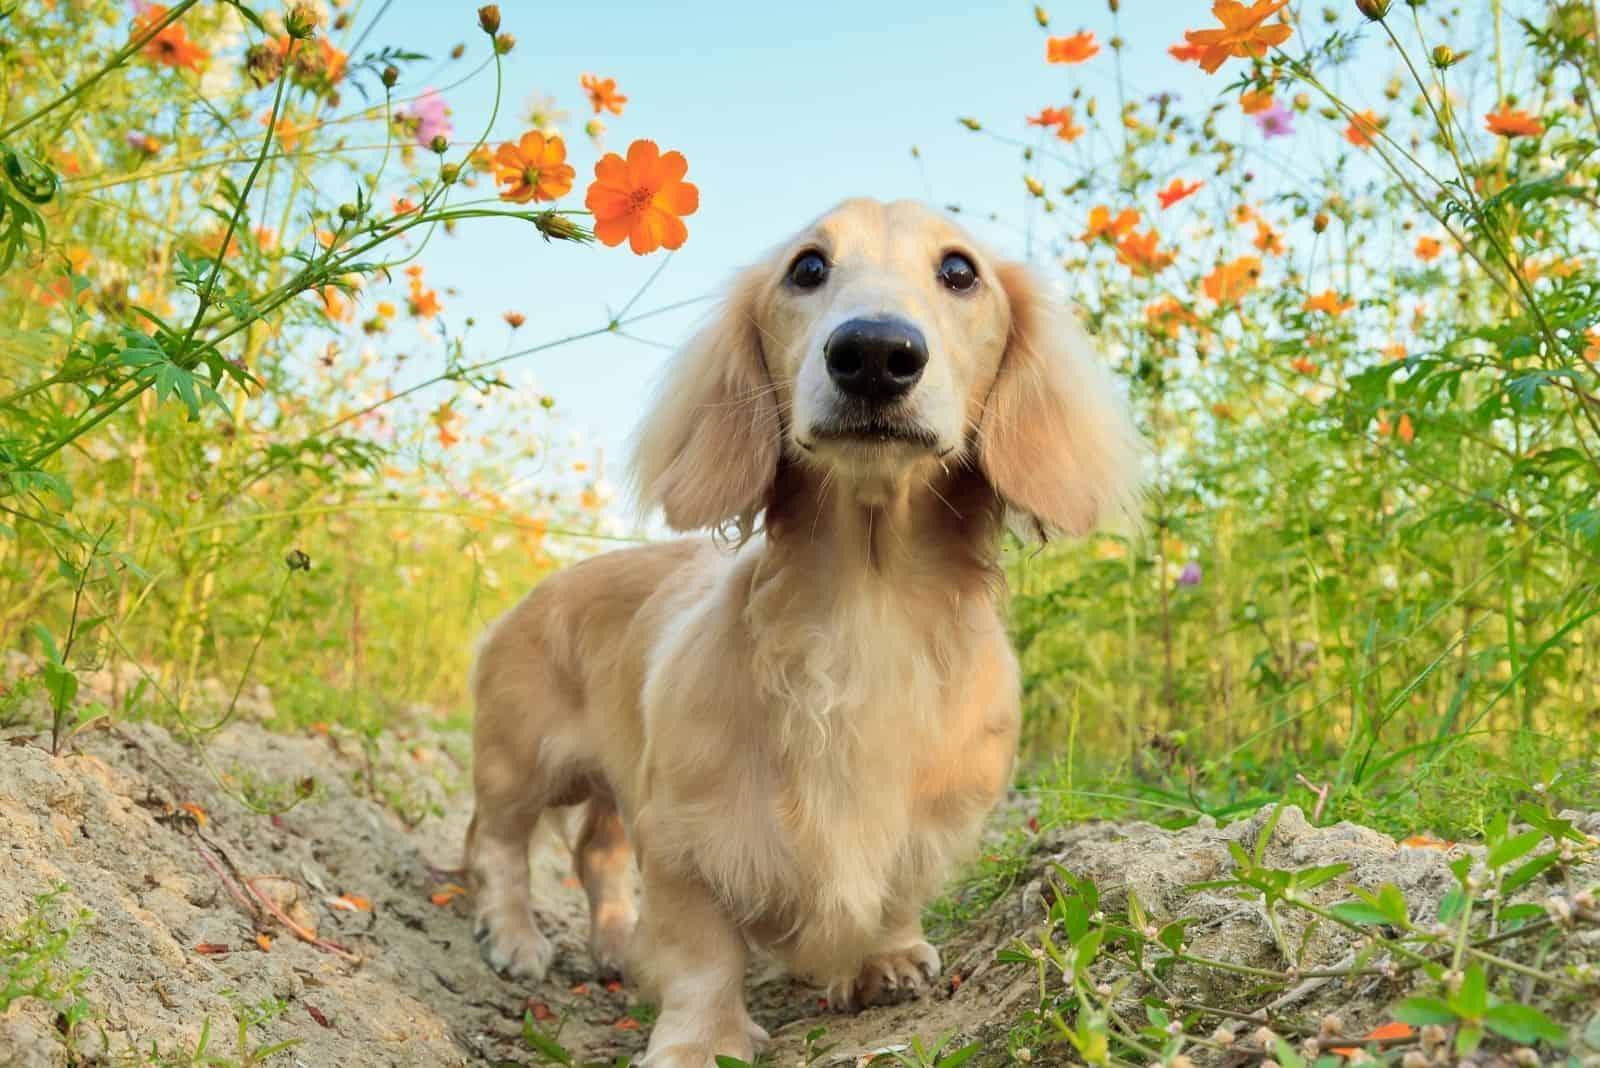 long hair dachshund playing in the garden